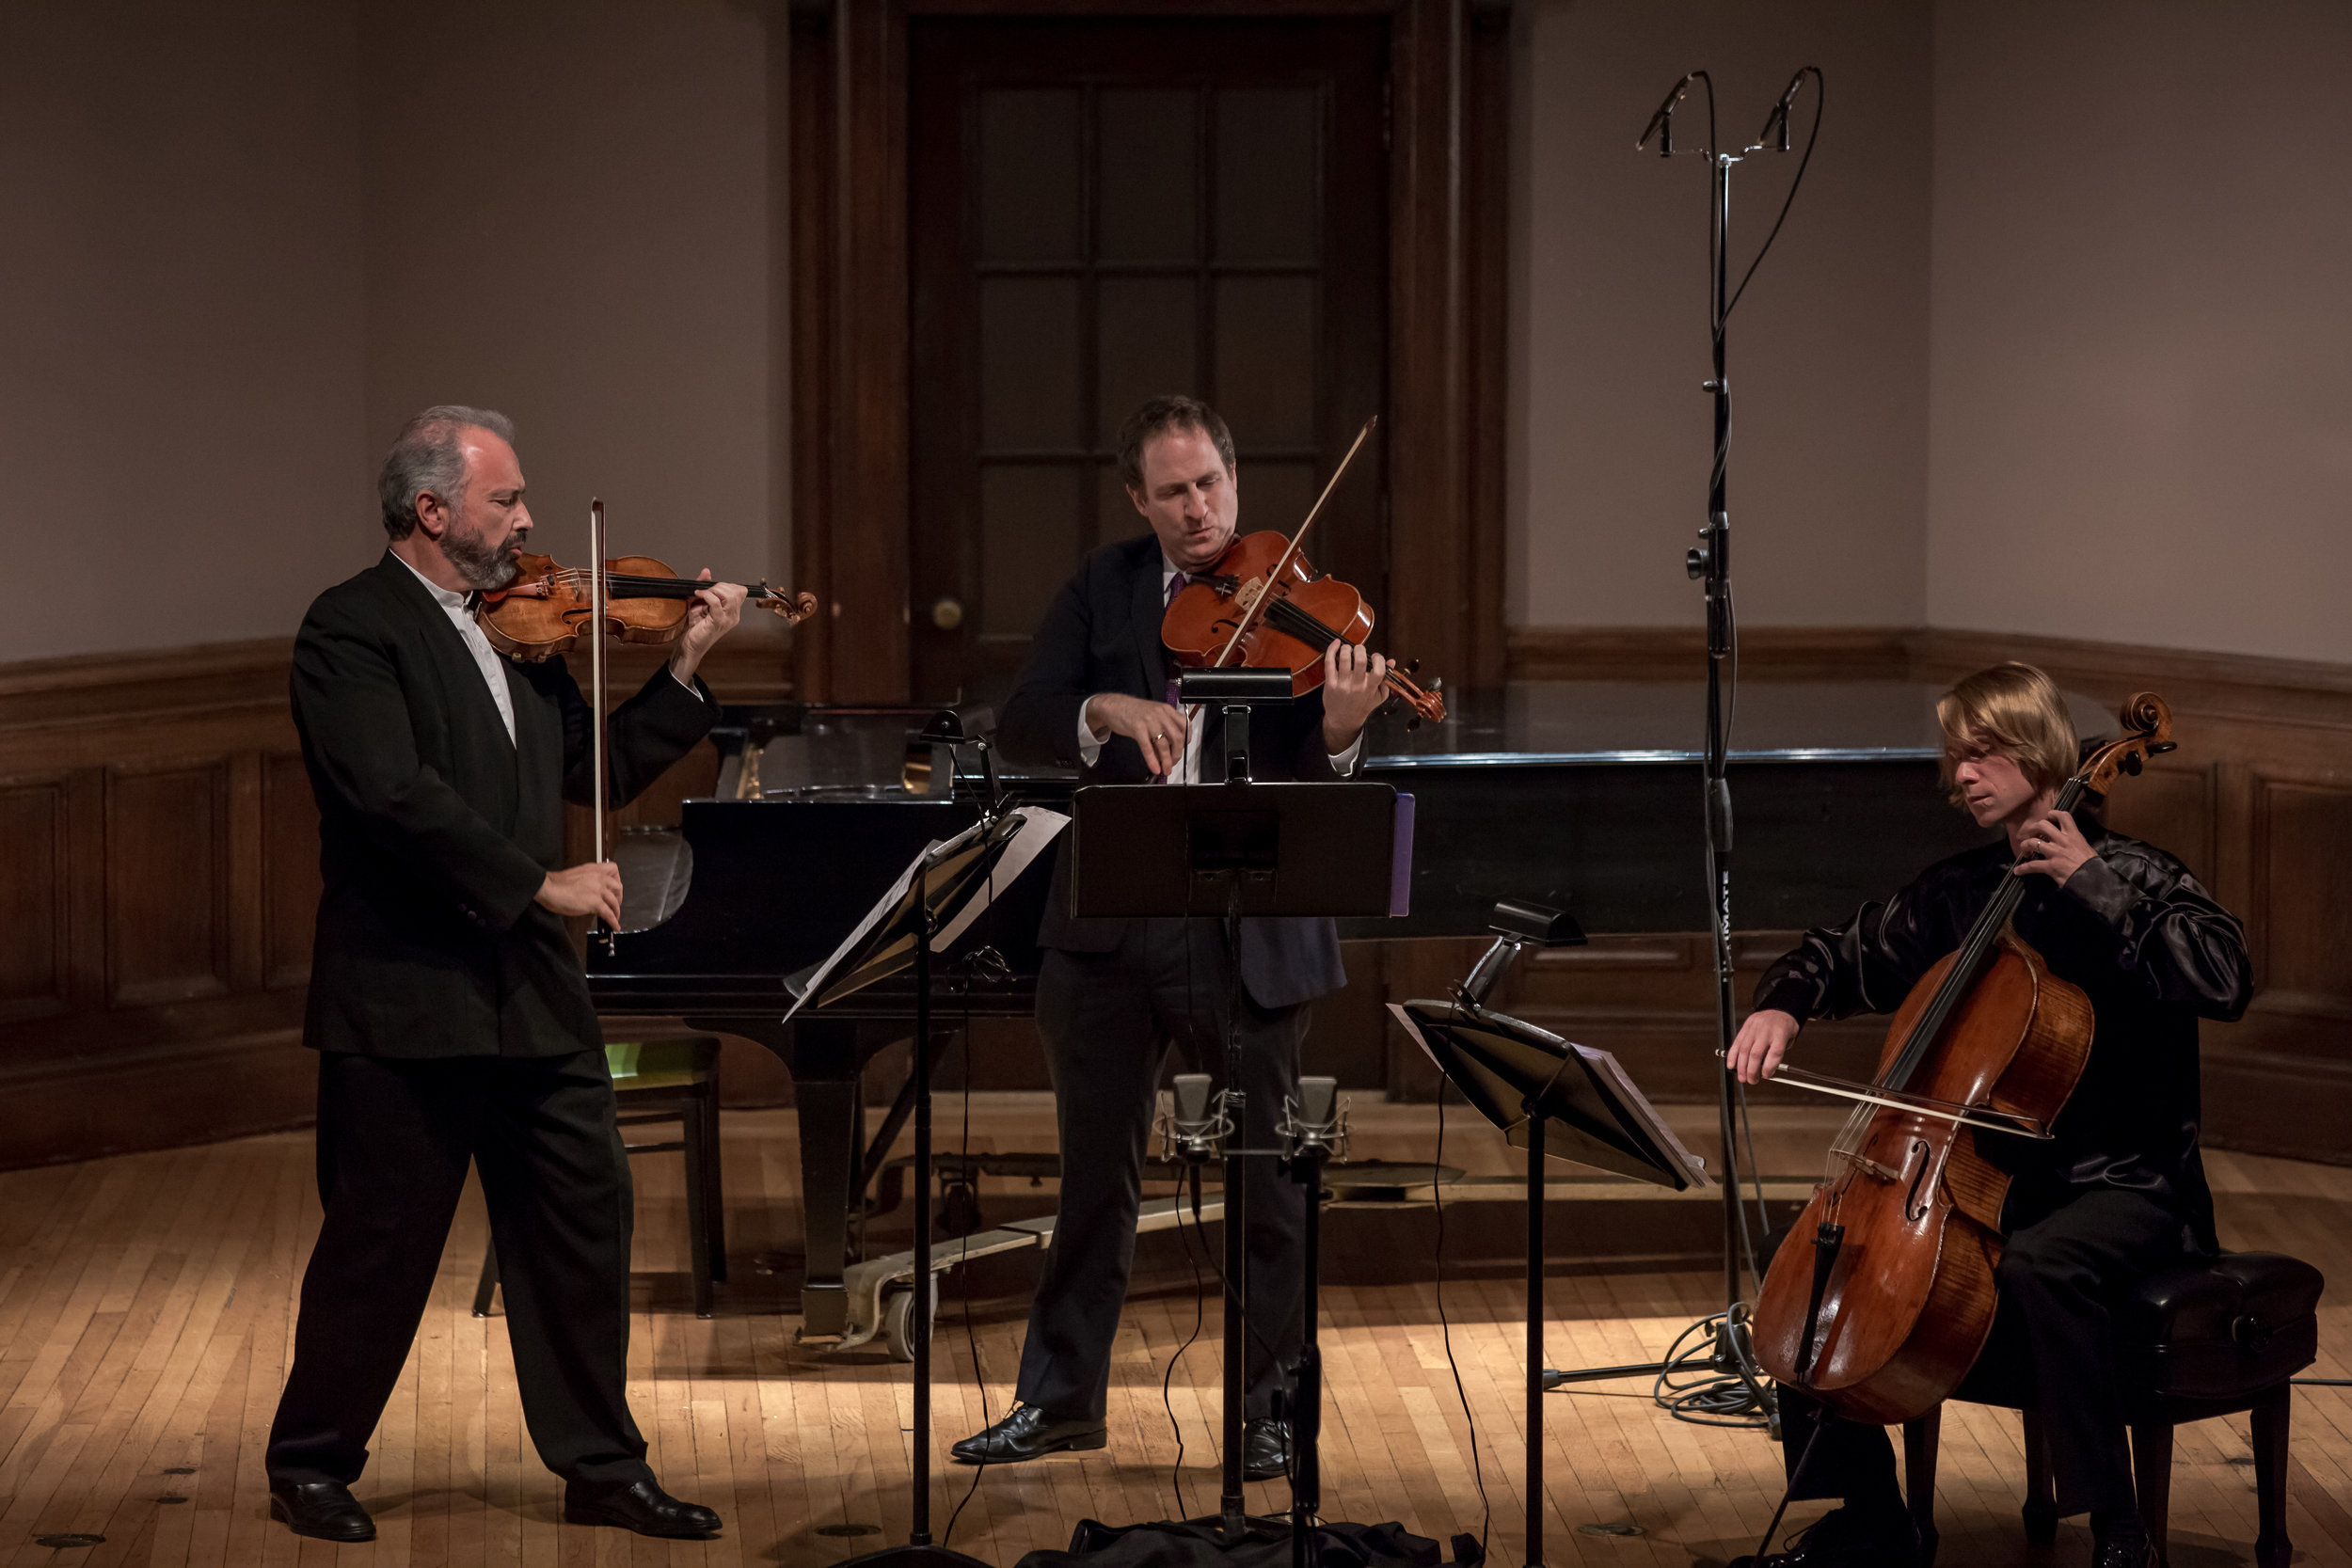 BACH AND MOZART: A LASTING LEGACY - october 5, 2016. italian academyDmitry Sitkovetsky, violinDov Scheindlin, violaSergey Antonov, celloIgnat Solzhenitsyn, pianoIllustrated talk by Paul BerryMozart - Prelude and Fugue in D minor for string trio, K404a No. 1J.S. Bach - Fifteen Sinfonias, BWV 787801 (arr. D. Sitkovetsky)Mozart - Piano Quartet in E flat major, K493